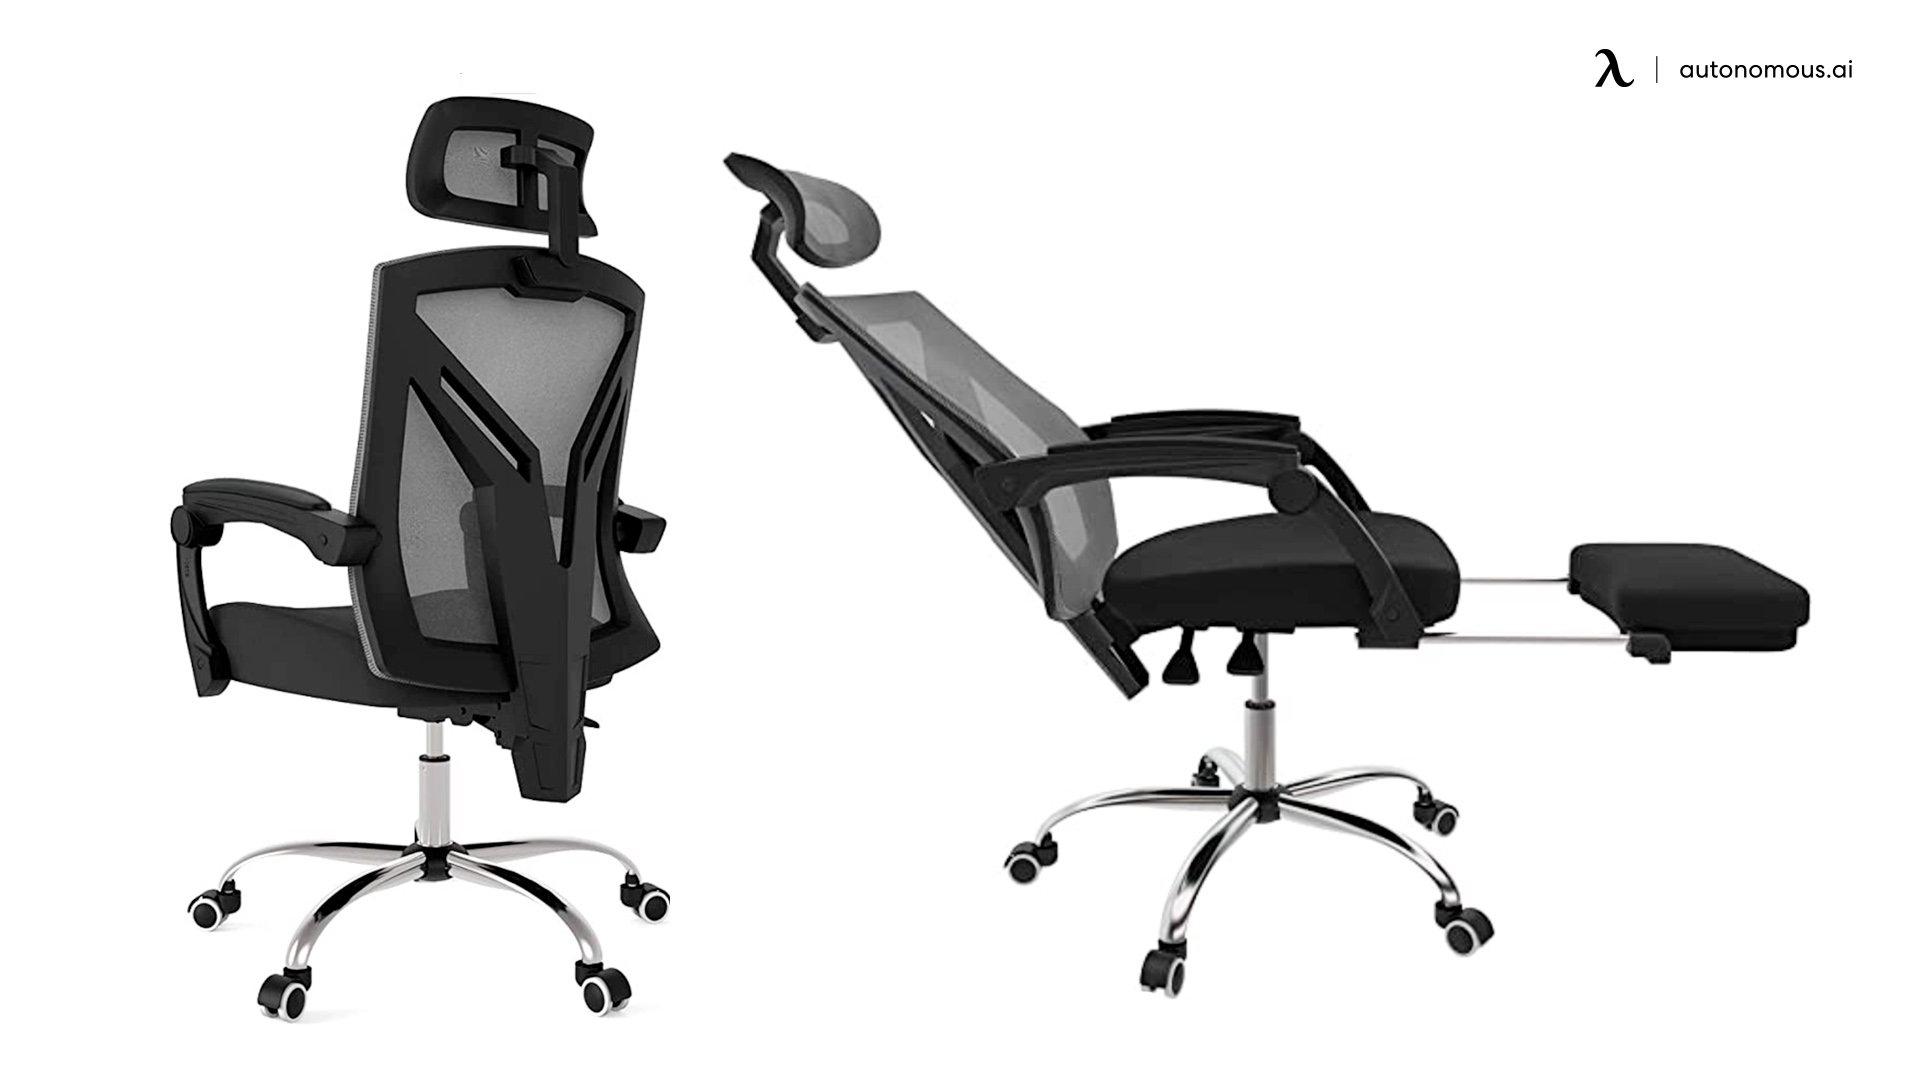 Hbada Ergonomic Office Recliner Chair with Footrest